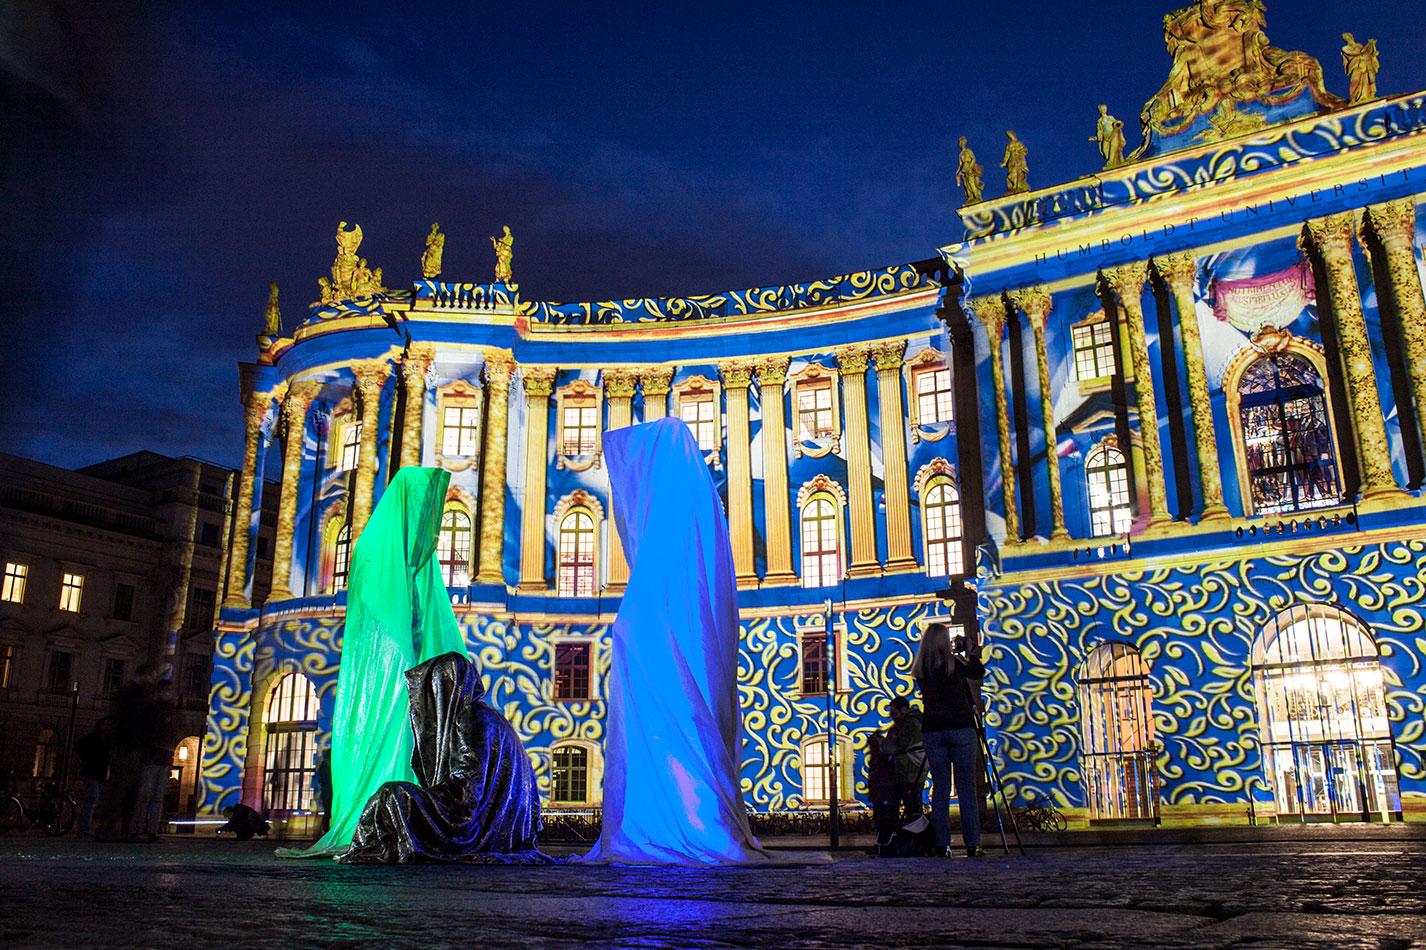 festival-of-lights-berlin-humboldt-university-light-art-show-exhibition-lumina-guardians-of-time-manfred-kili-kielnhofer-contemporary-arts-design-sculpture-3366